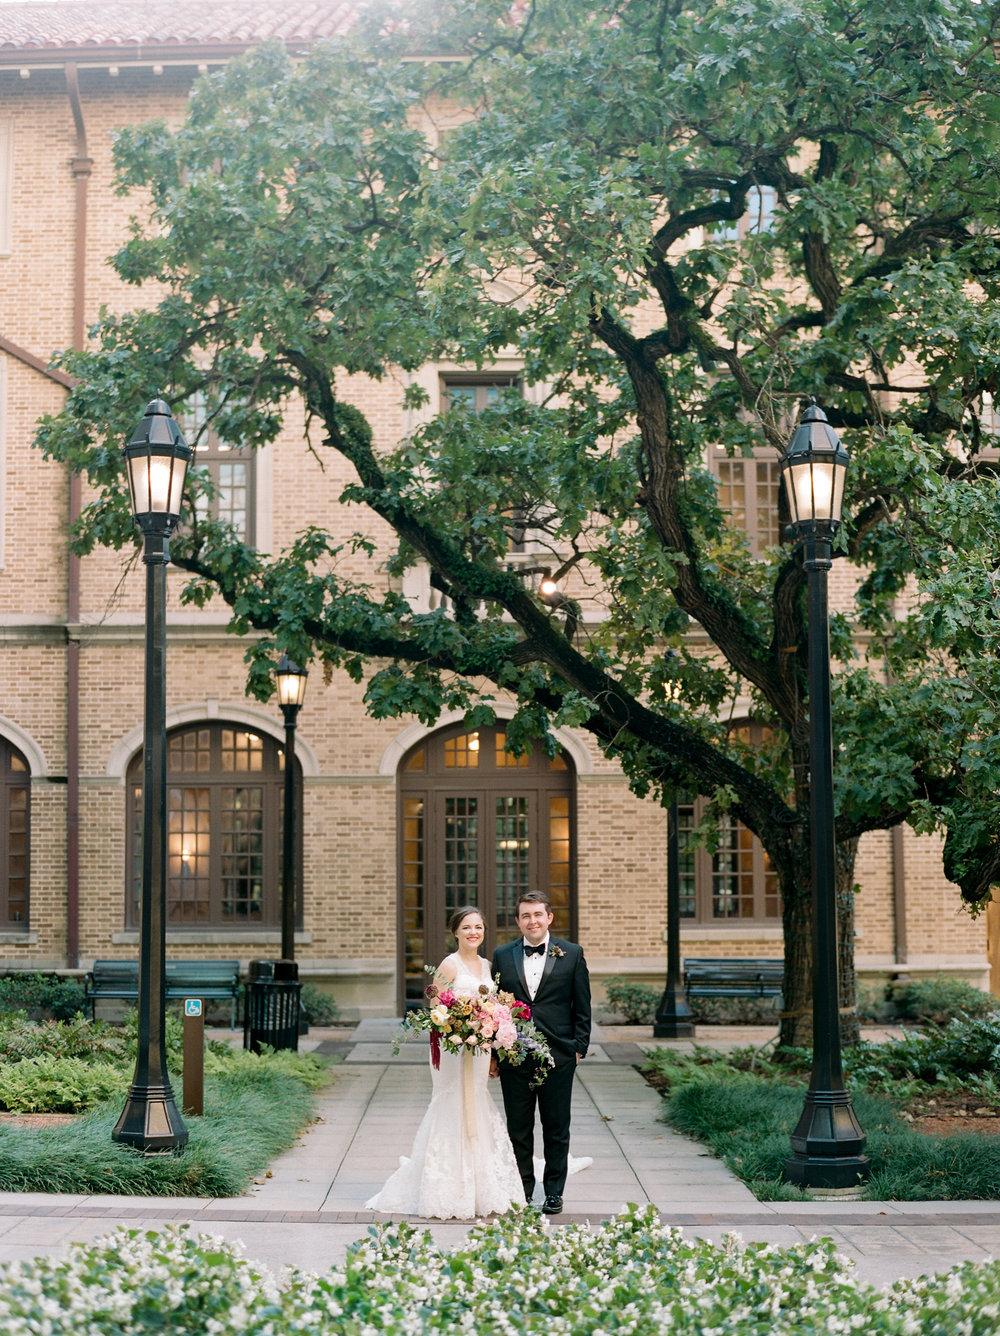 The-Knot-Texas-Fine-Art-Wedding-Film-Destination-Photographer-Houston-Austin-Dallas-New-Orleans-Julia-Ideson-Library-Event-Dana-Josh-Fernandez-Photograph-Top-Best-1.jpg